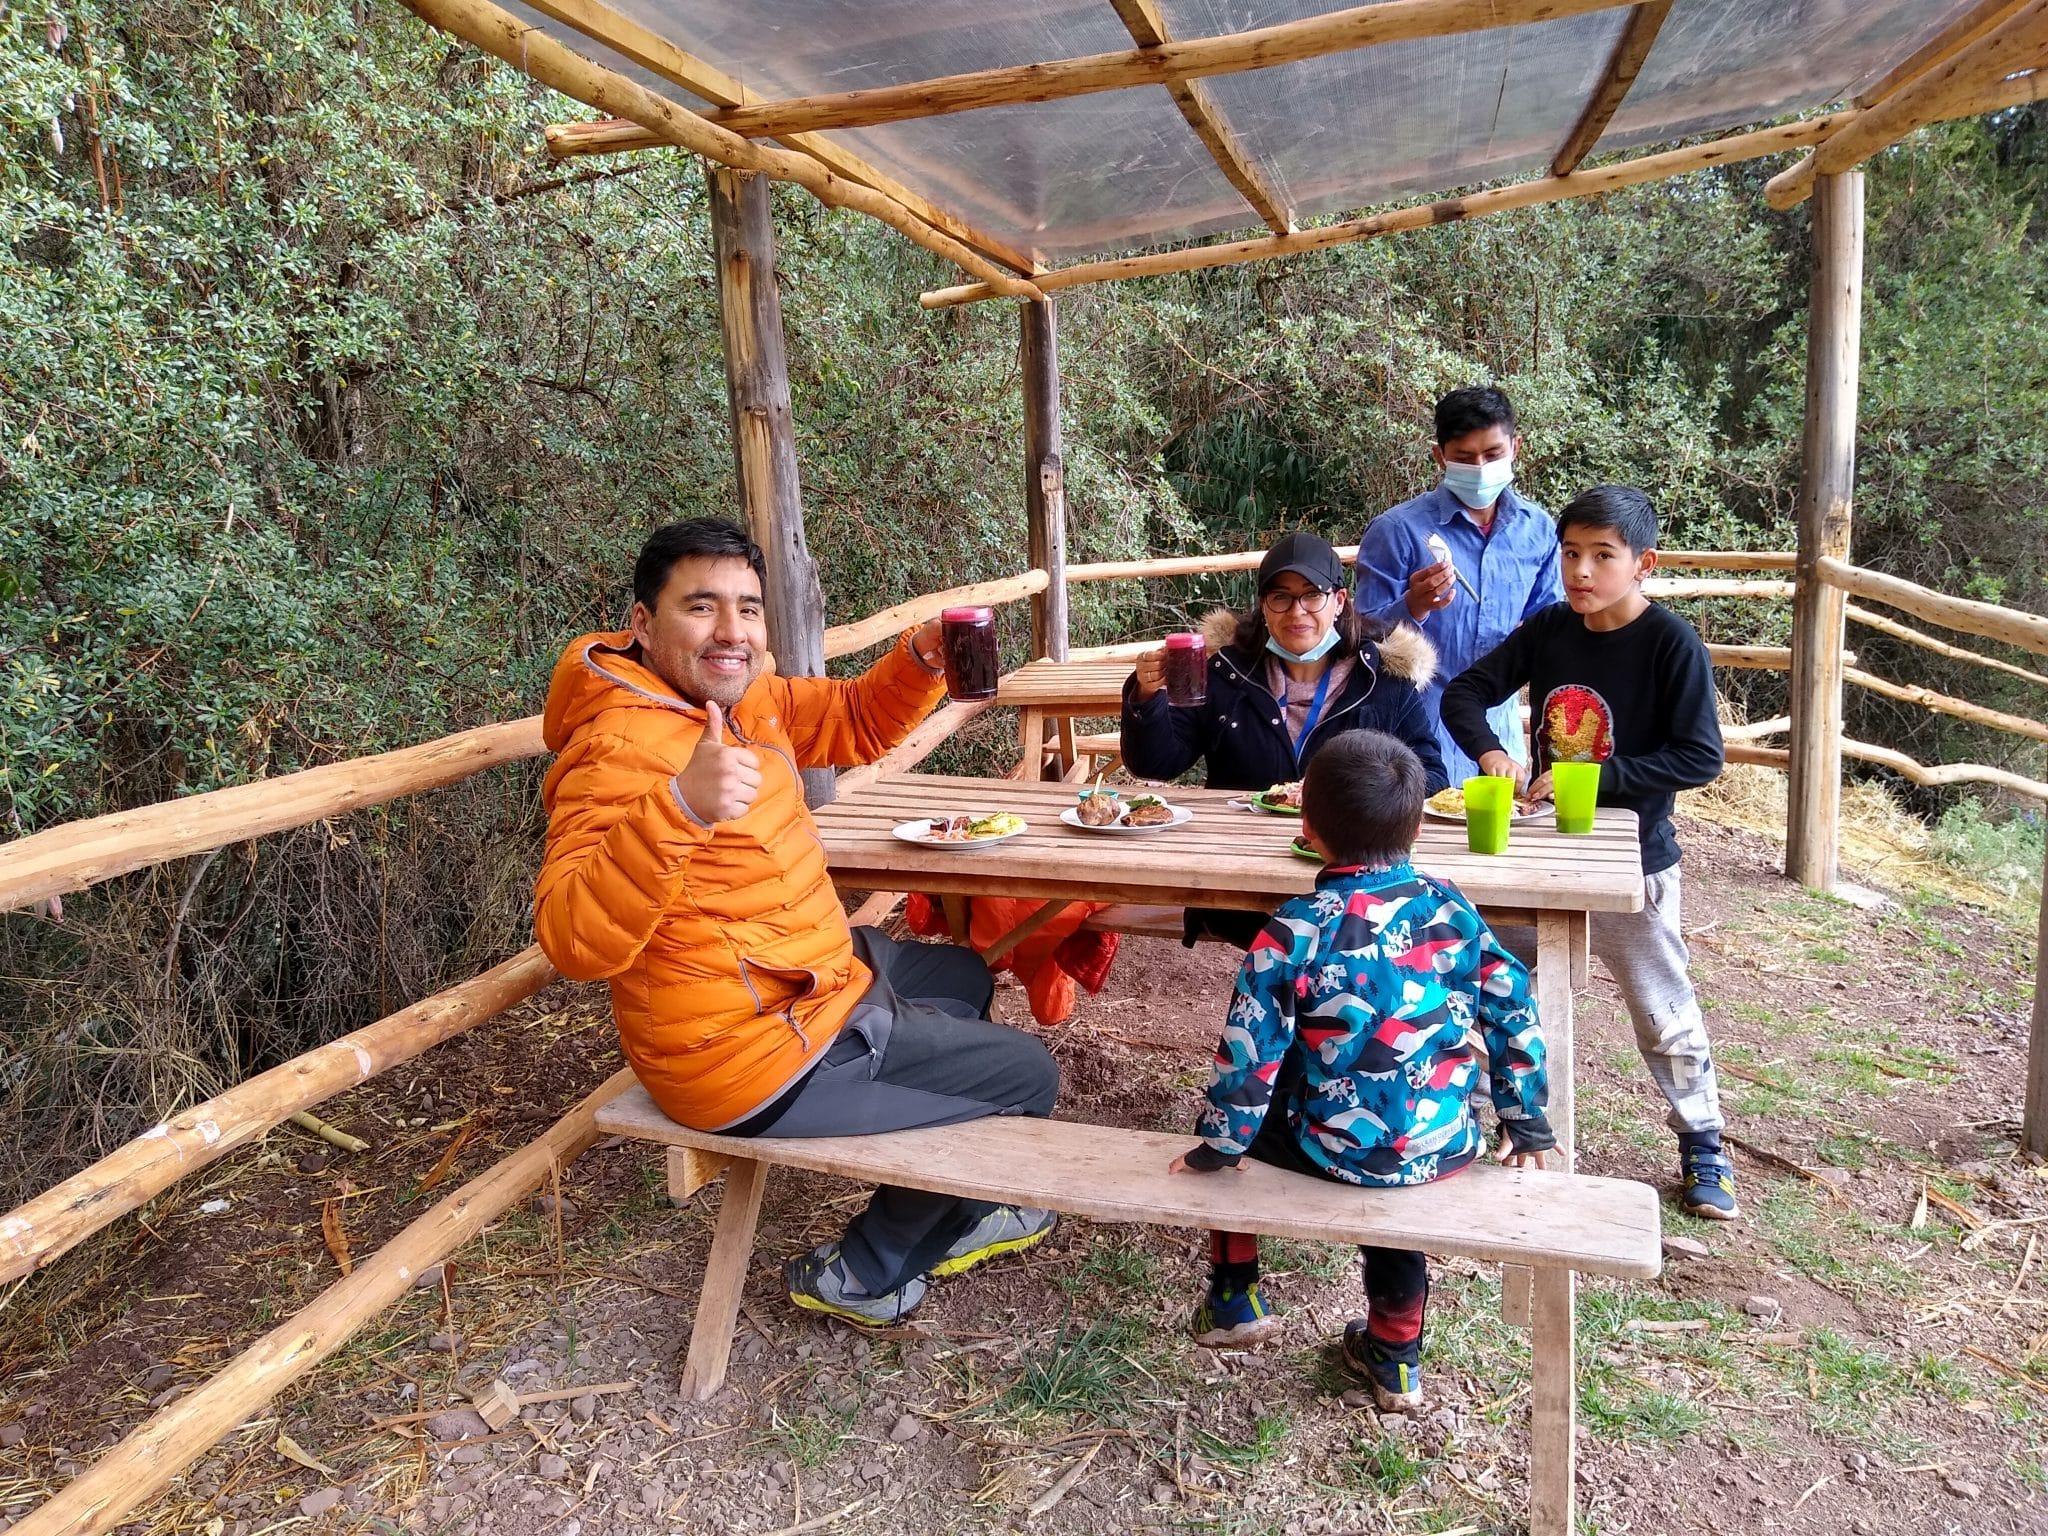 Family eating in Cusco